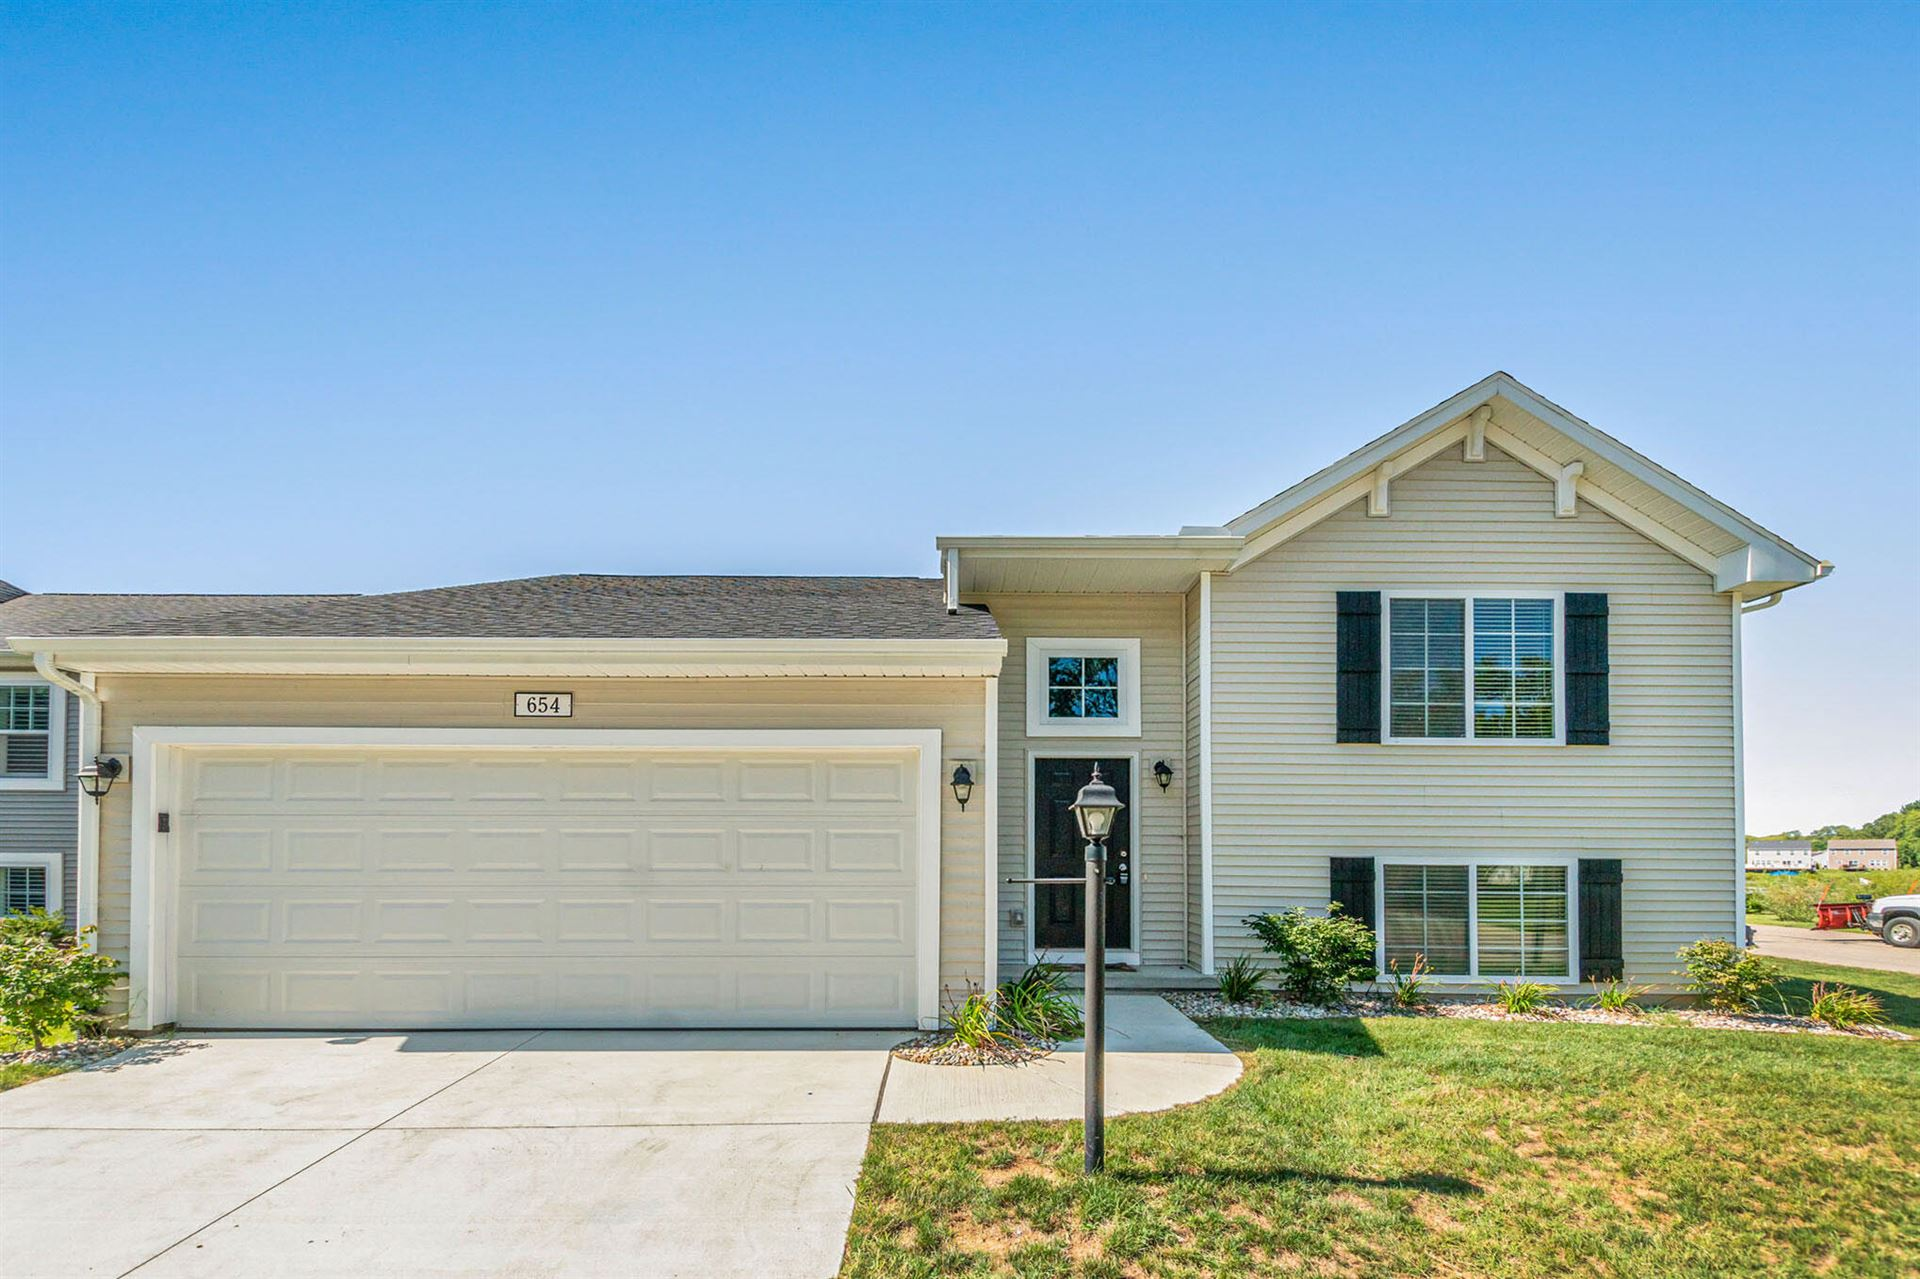 654 Cygnet Lake Drive, Benton Harbor, MI 49022 - MLS#: 21105763